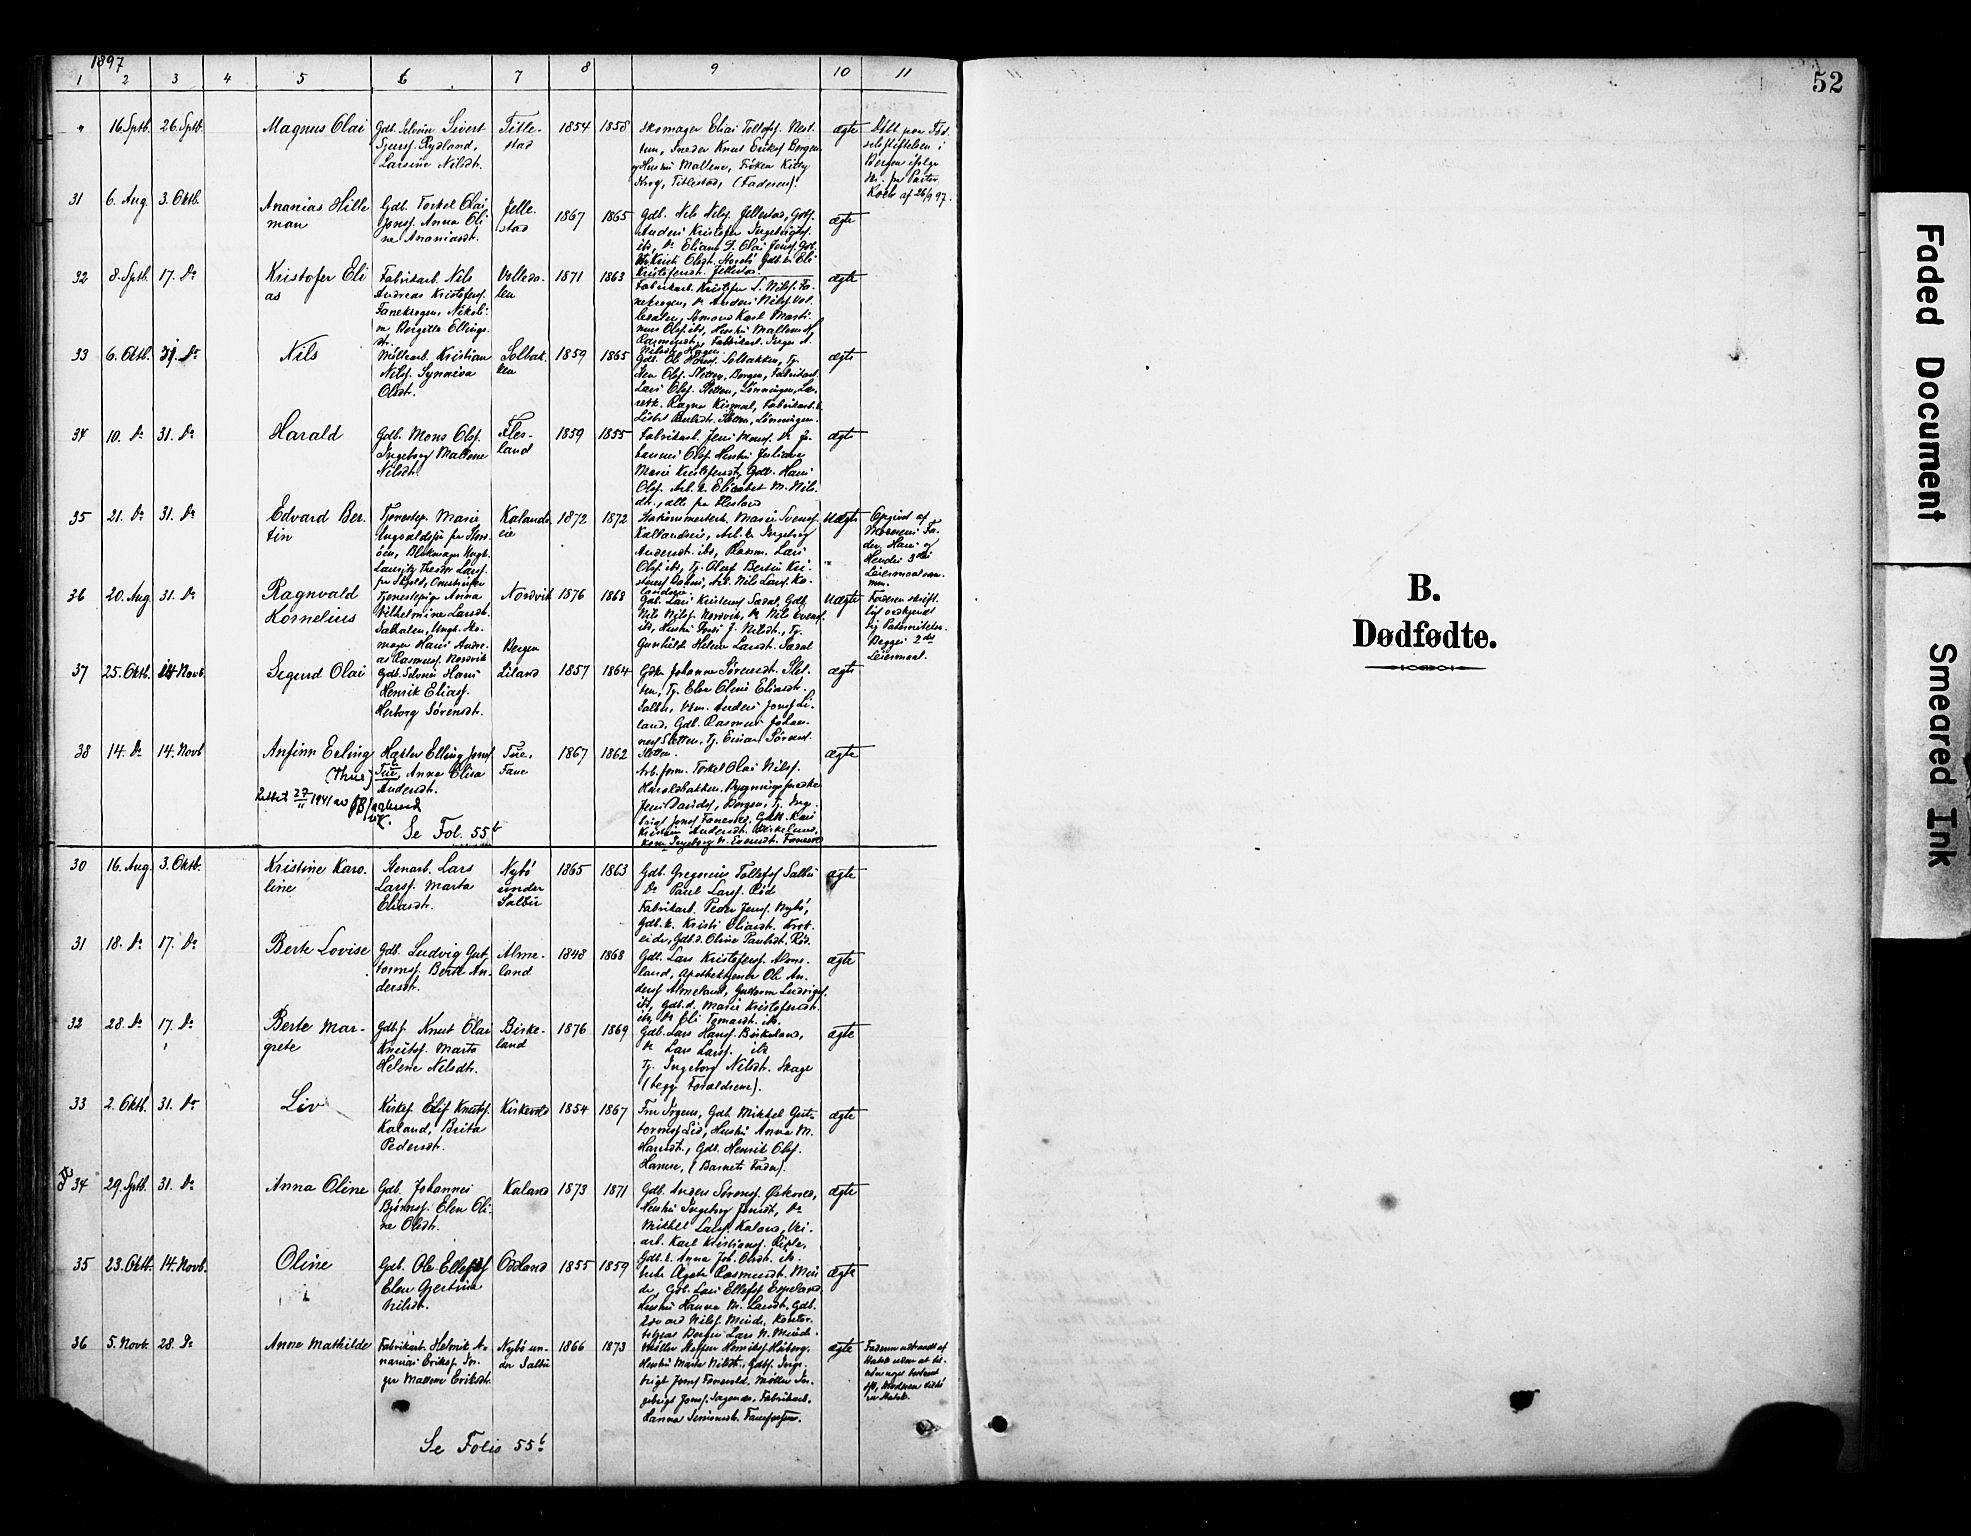 SAB, Fana Sokneprestembete, H/Haa/Haab/L0002: Ministerialbok nr. B 2, 1890-1897, s. 52